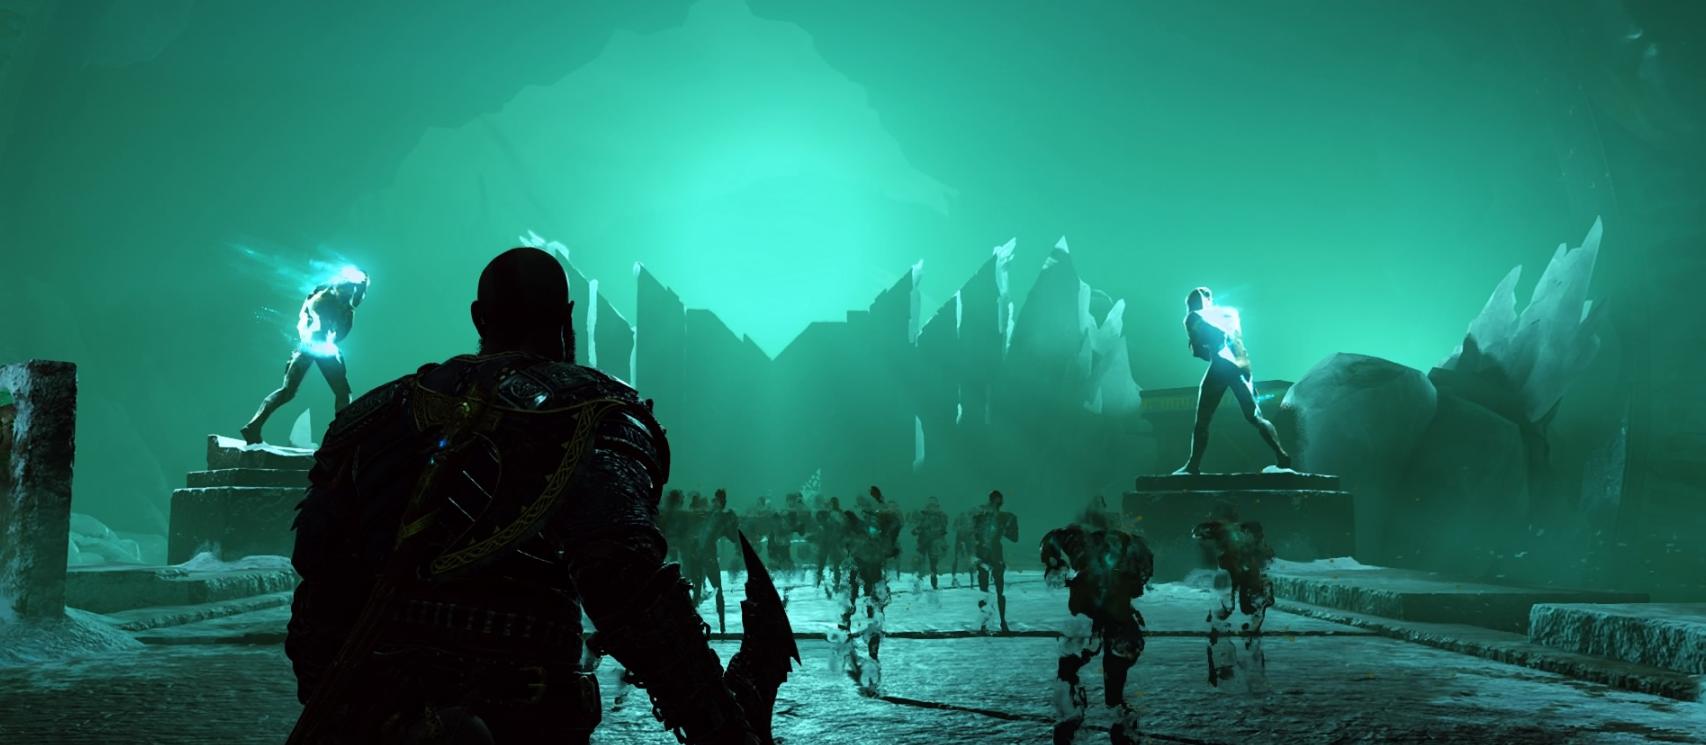 God of War: игра Santa Monica против мифологии 12